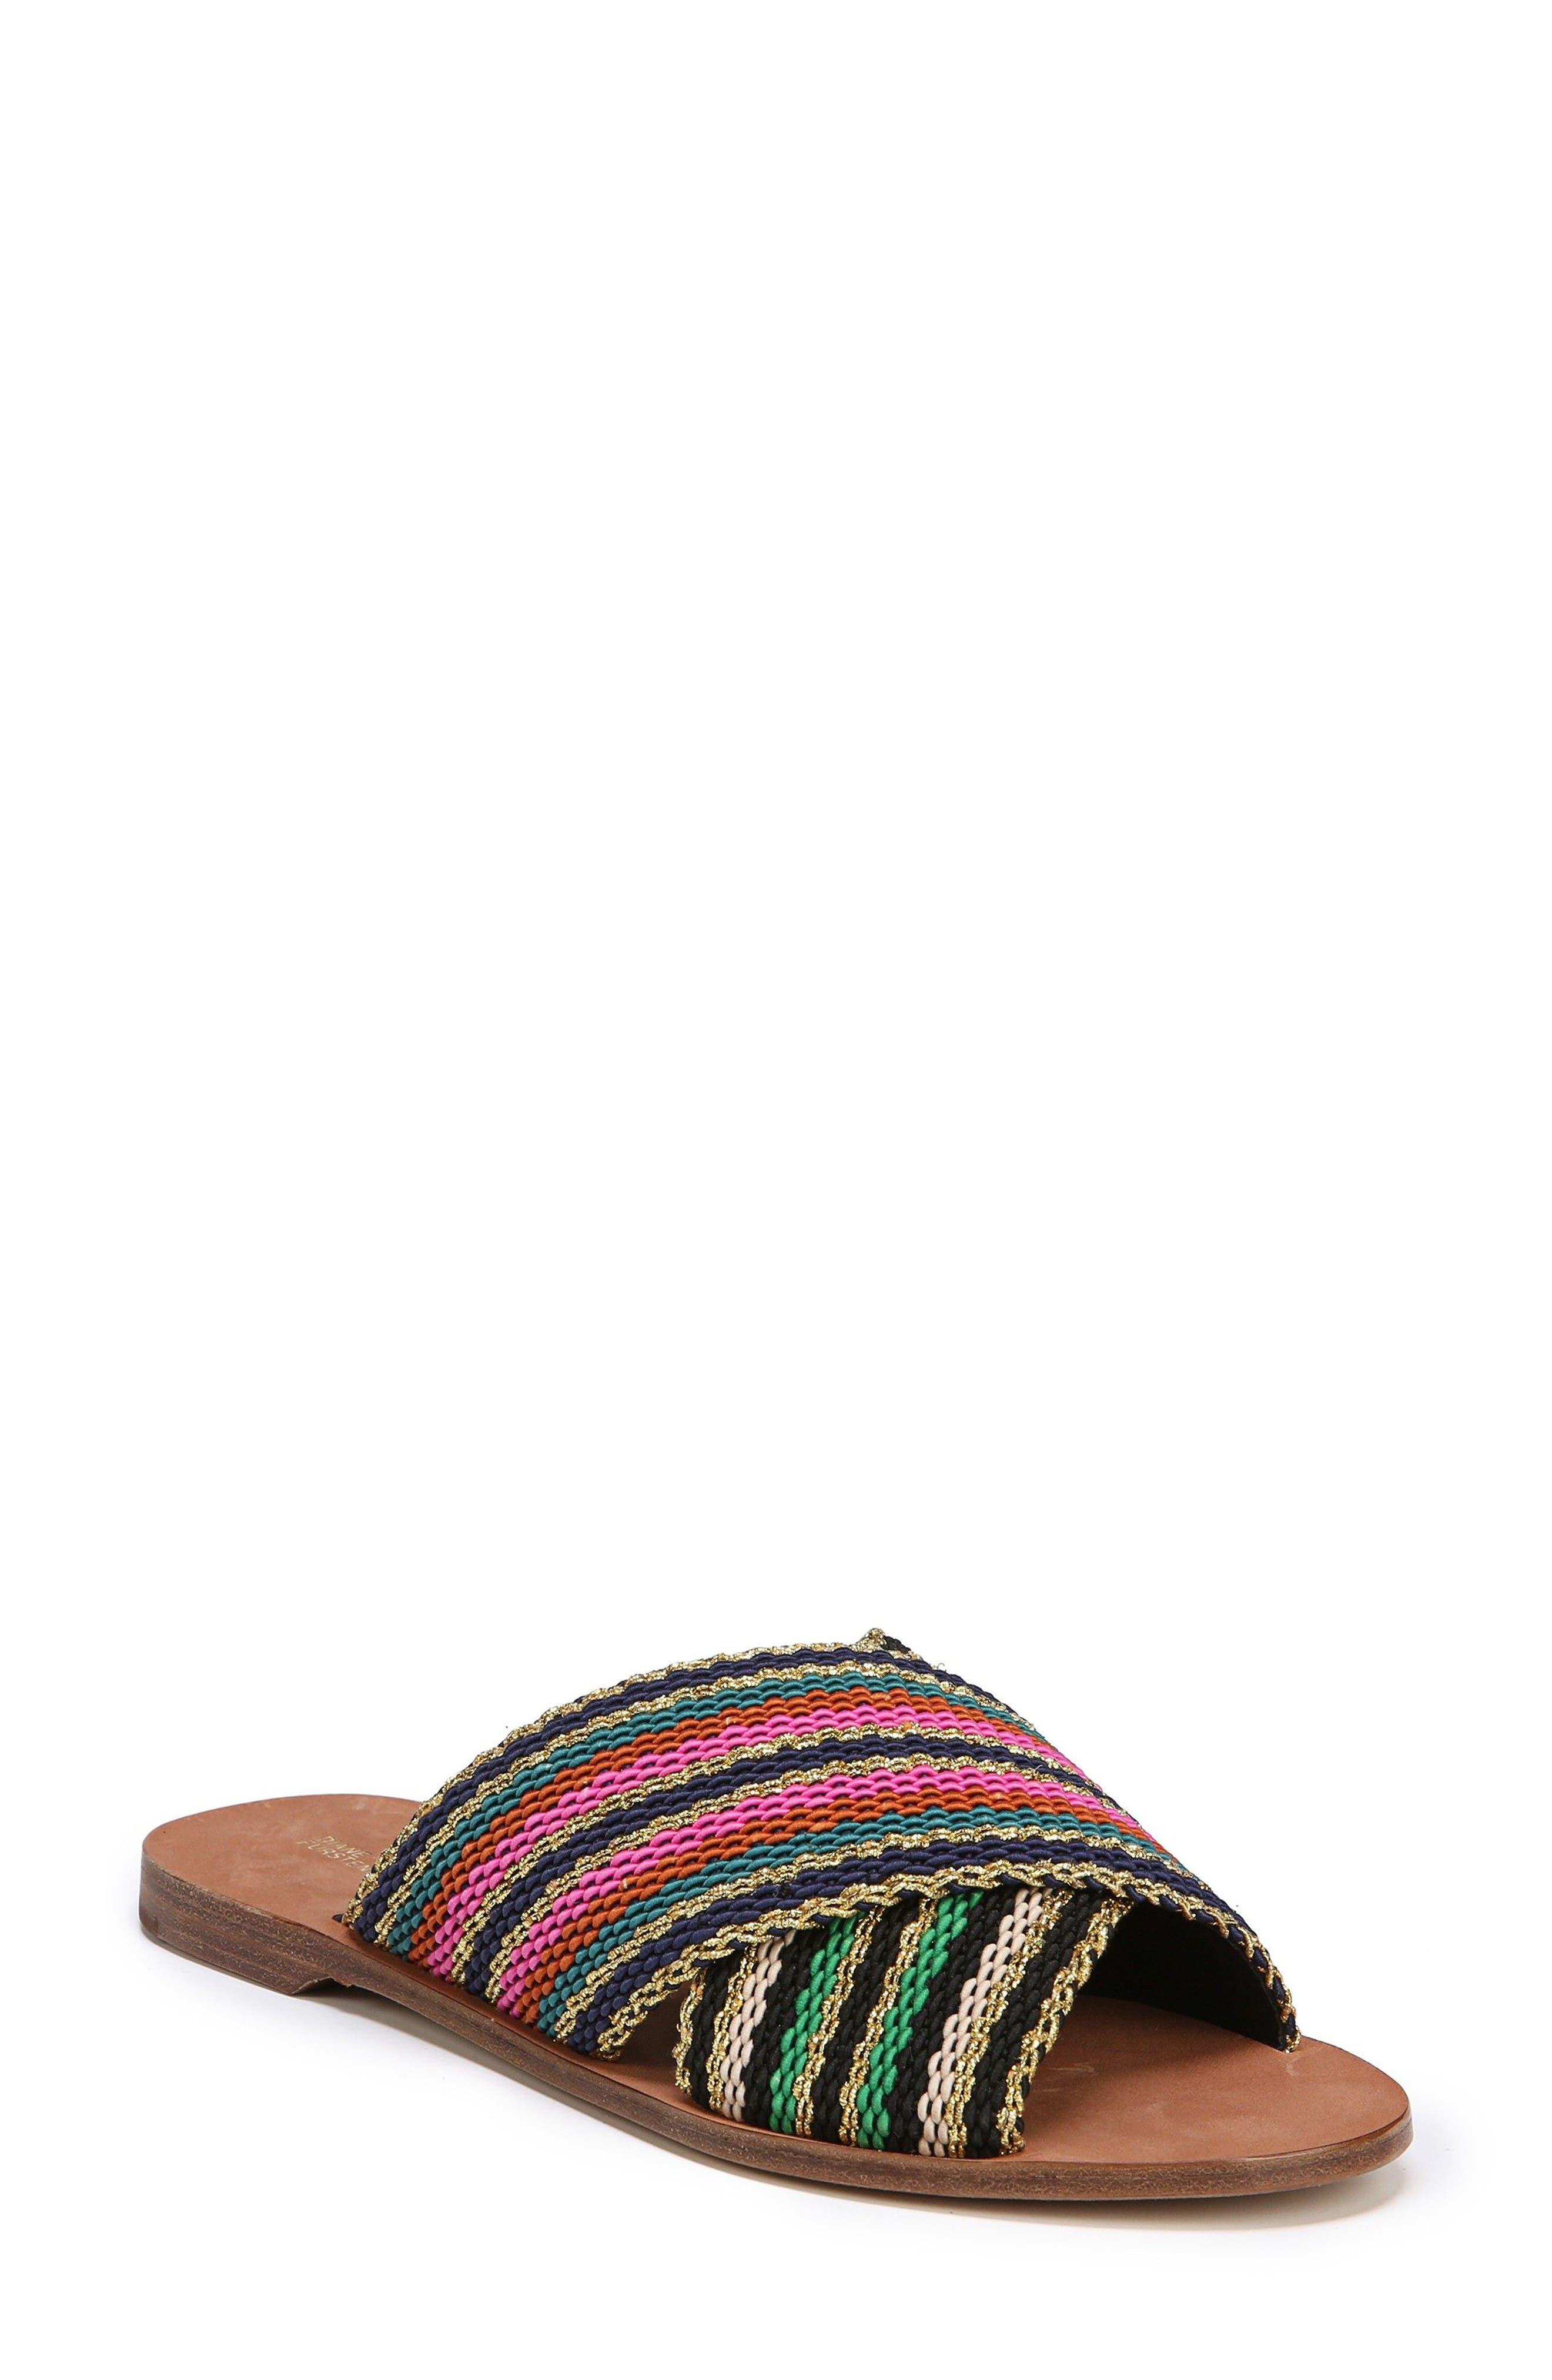 Diane von Furstenberg Cindi Woven Slide Sandal (Women)